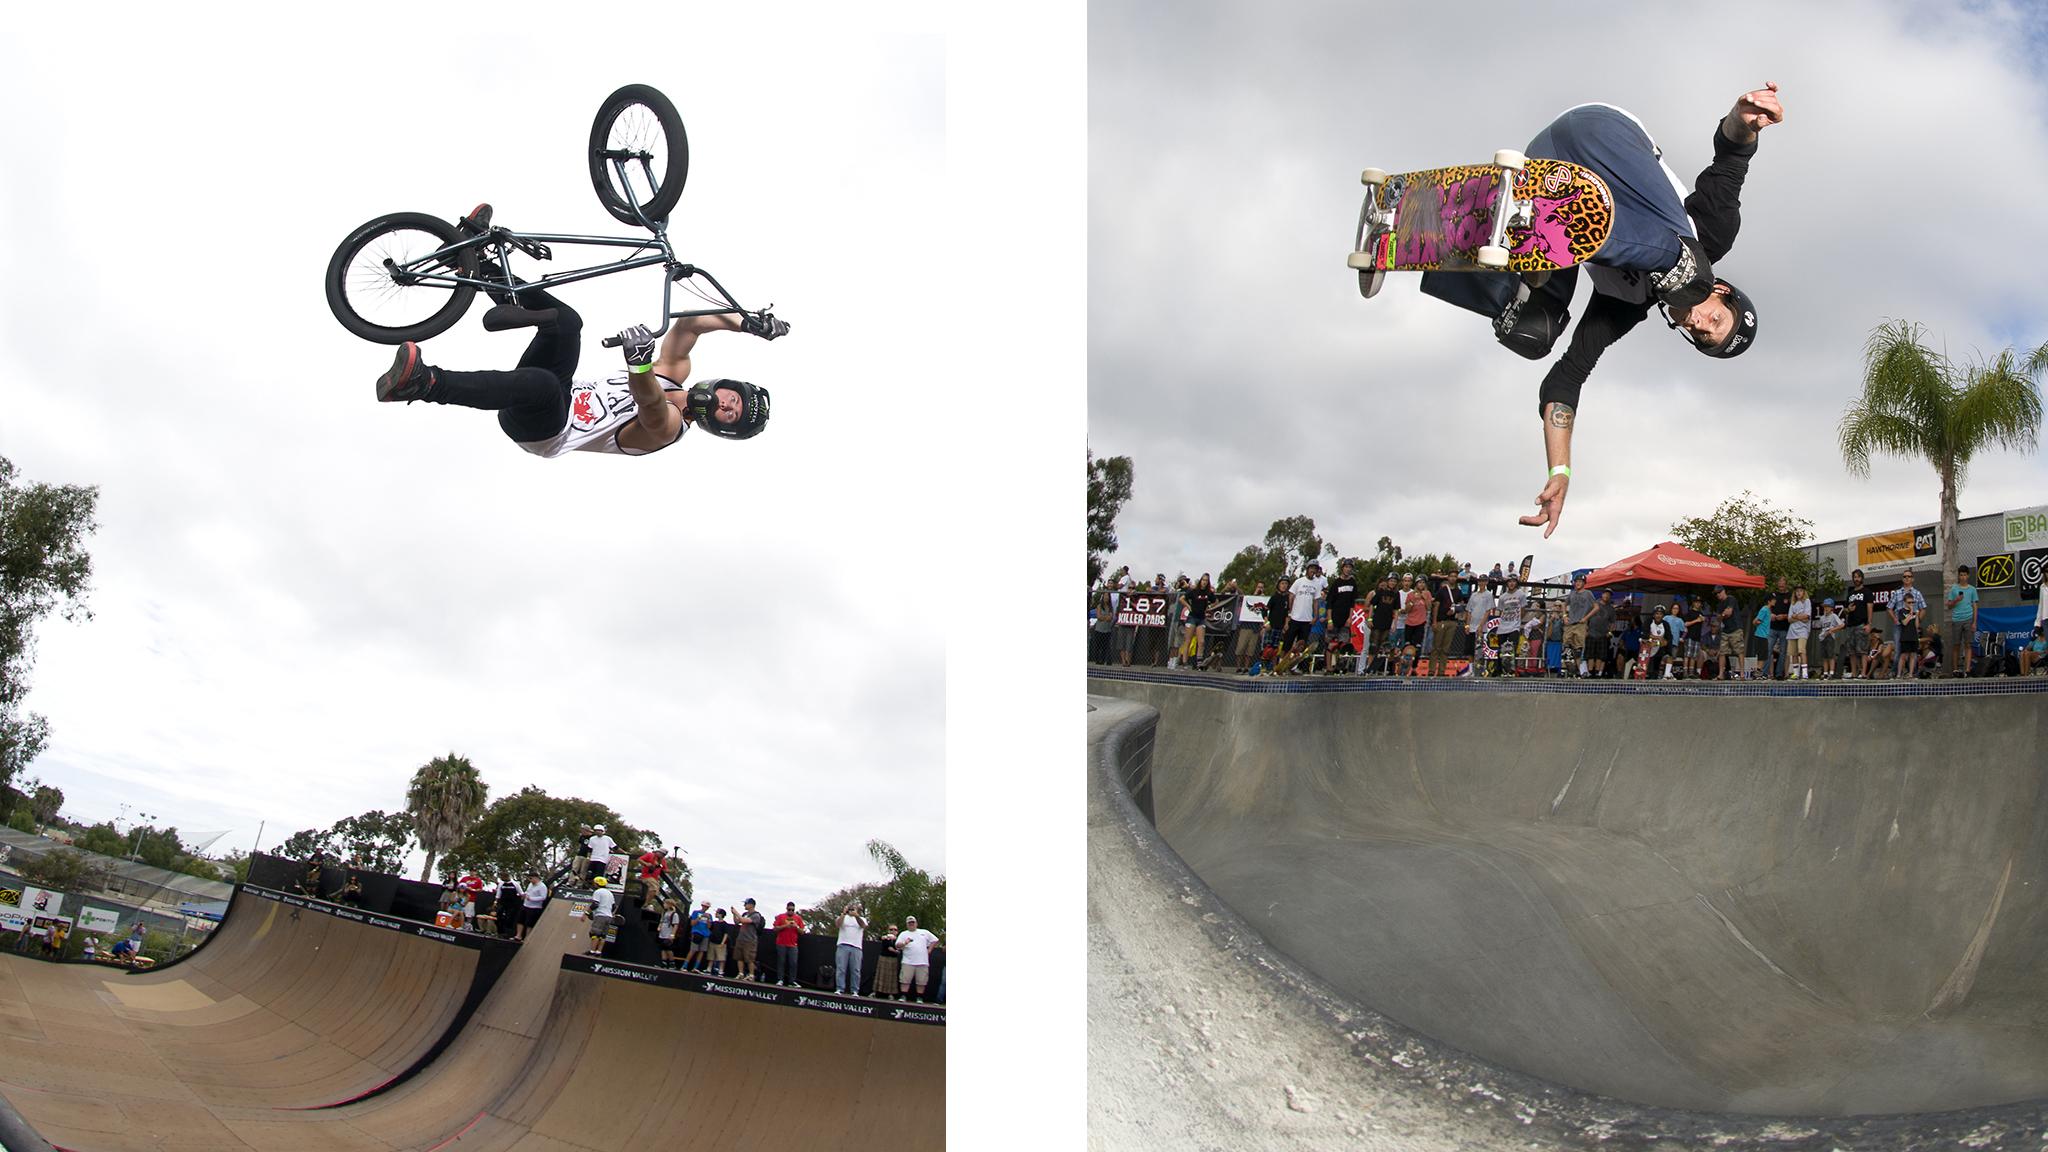 BMX vs. Skate